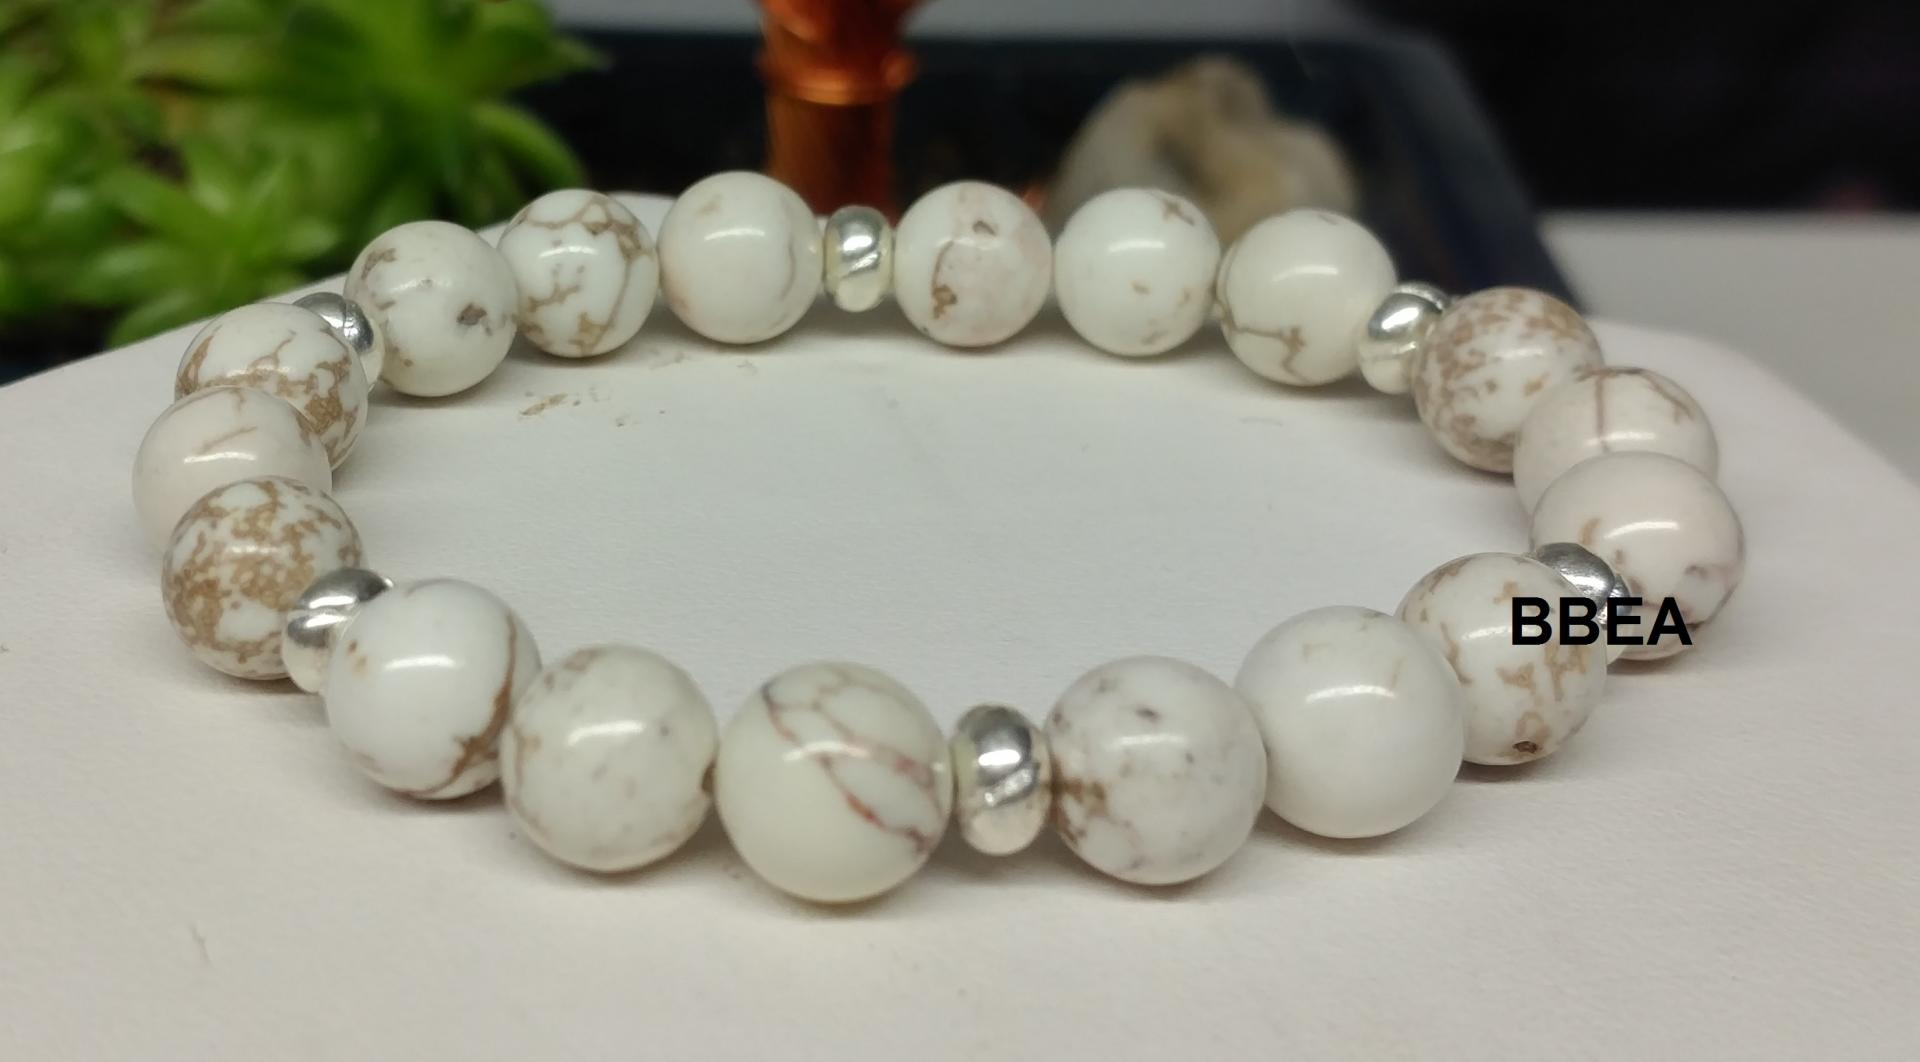 Bracelet magnesite 2 3